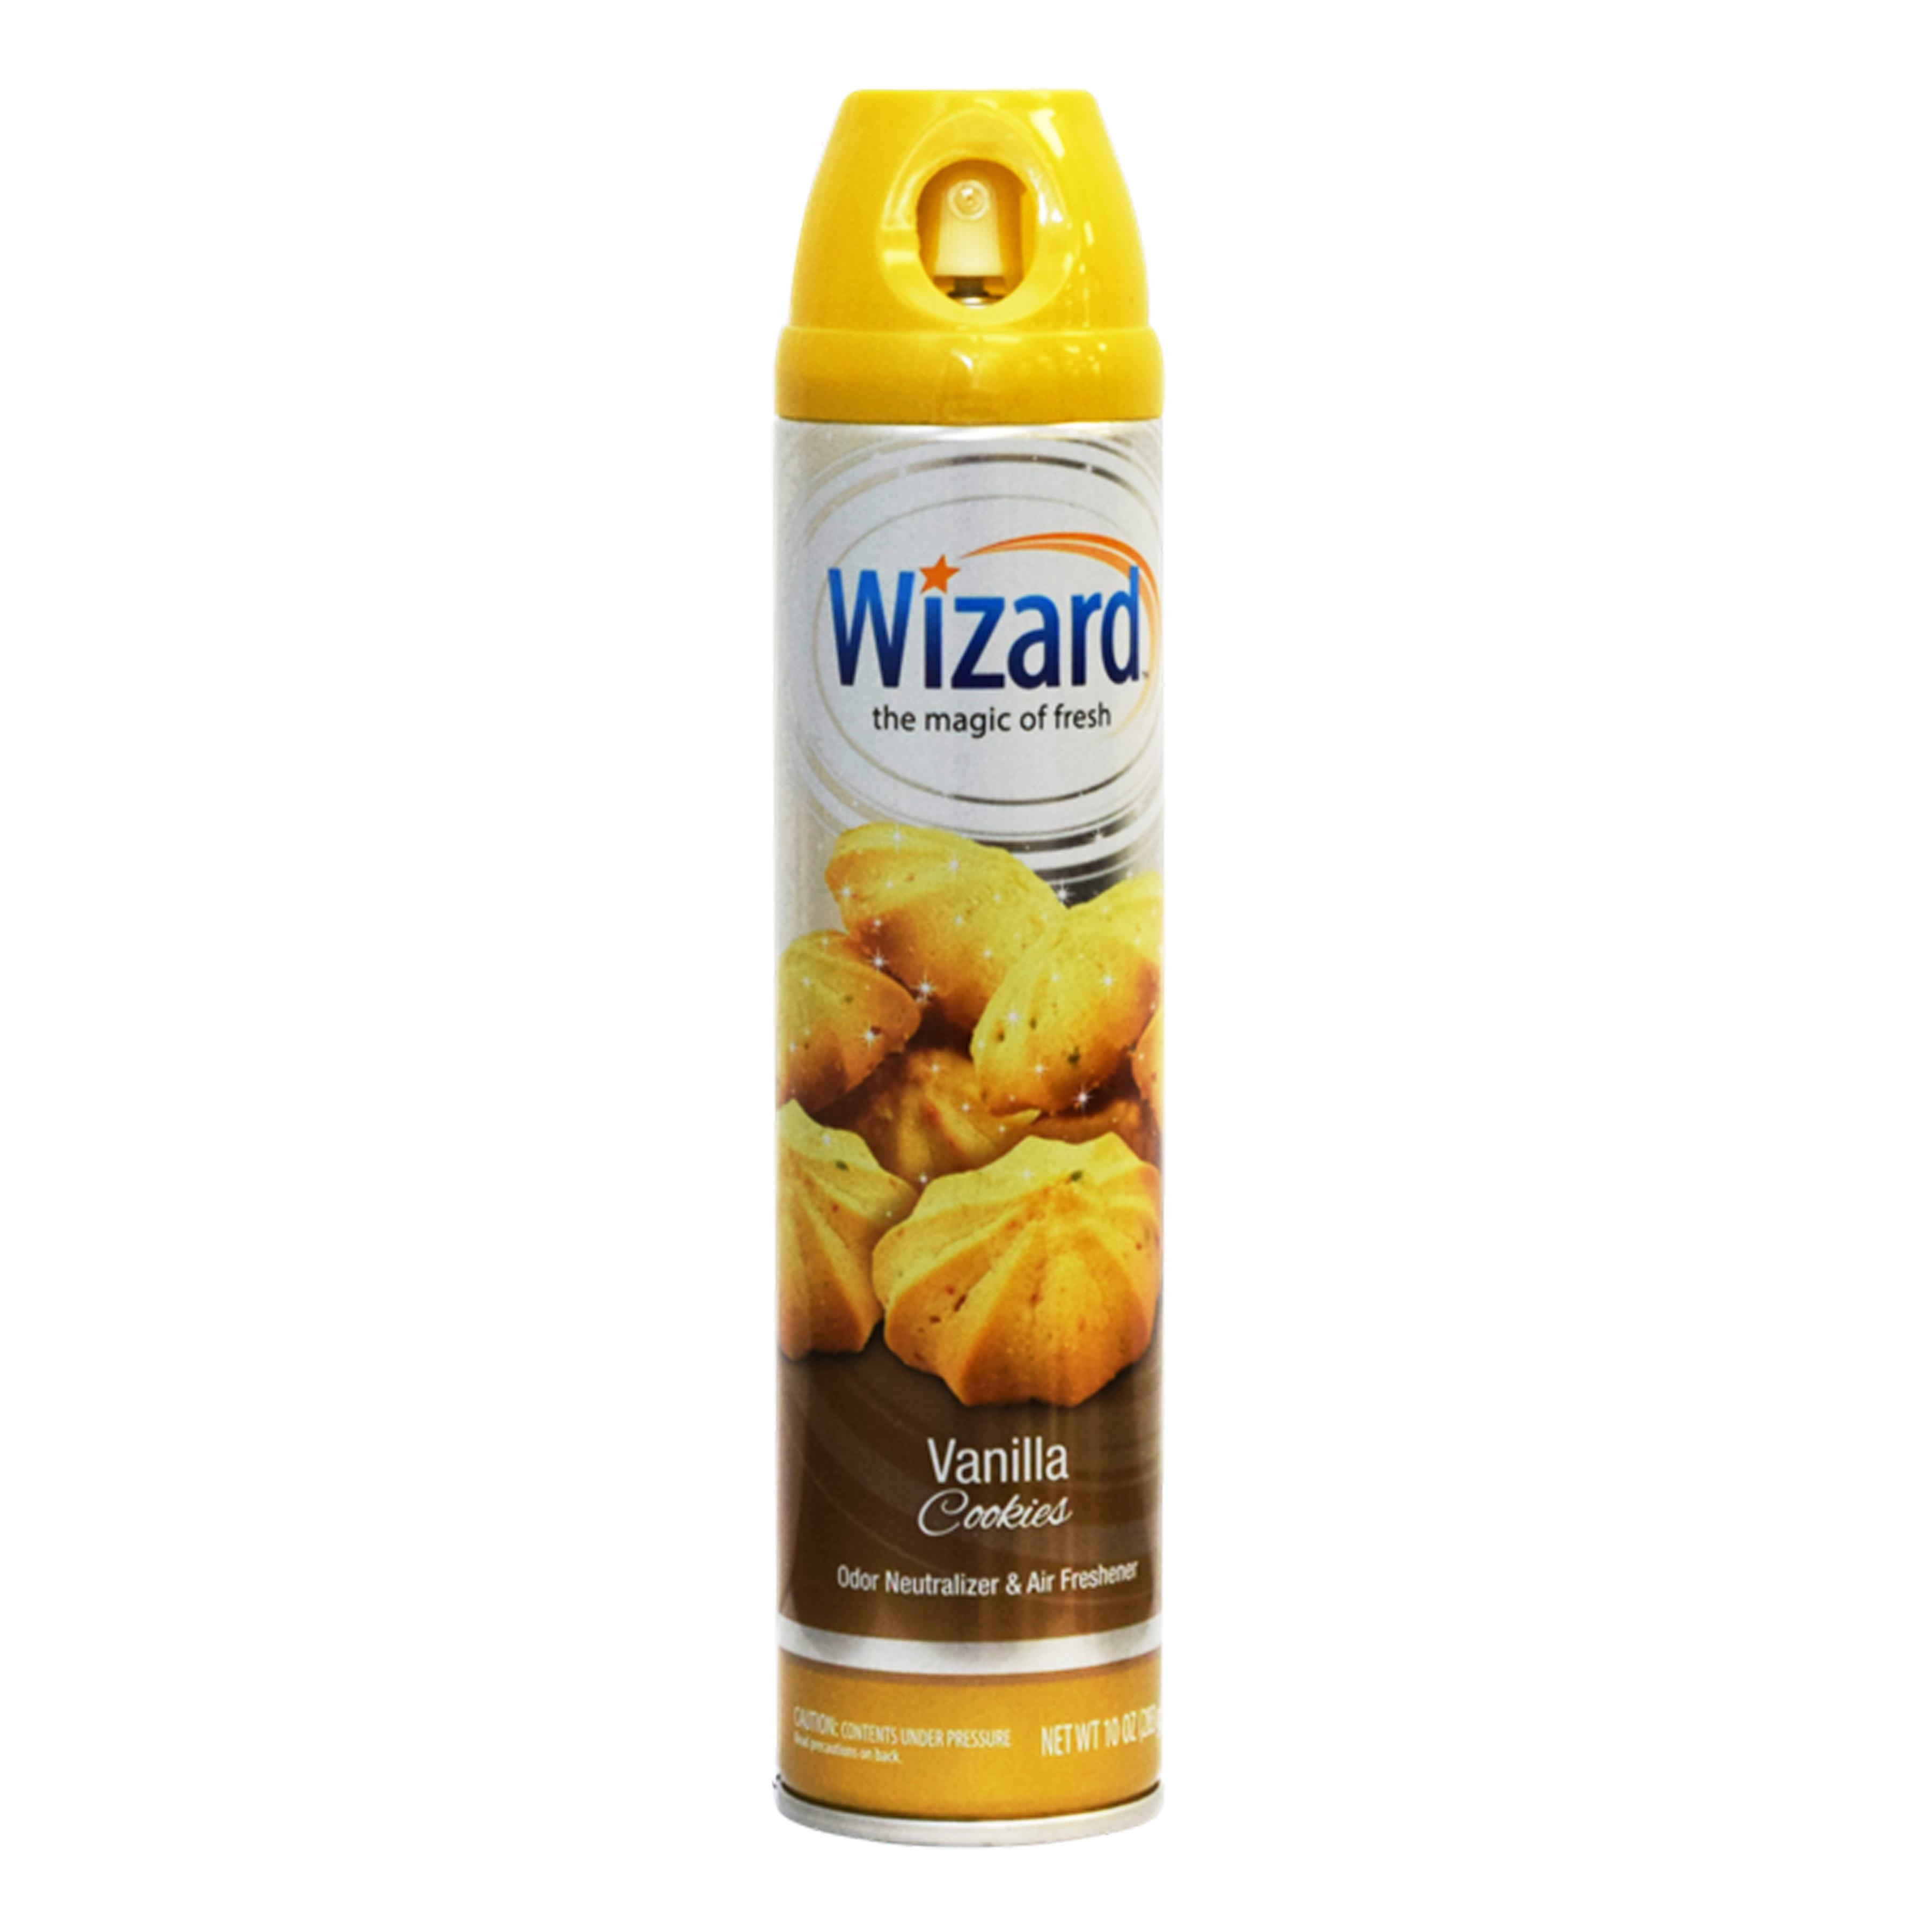 Wizard 10 oz. Aerosol Spray, Vanilla Cookie